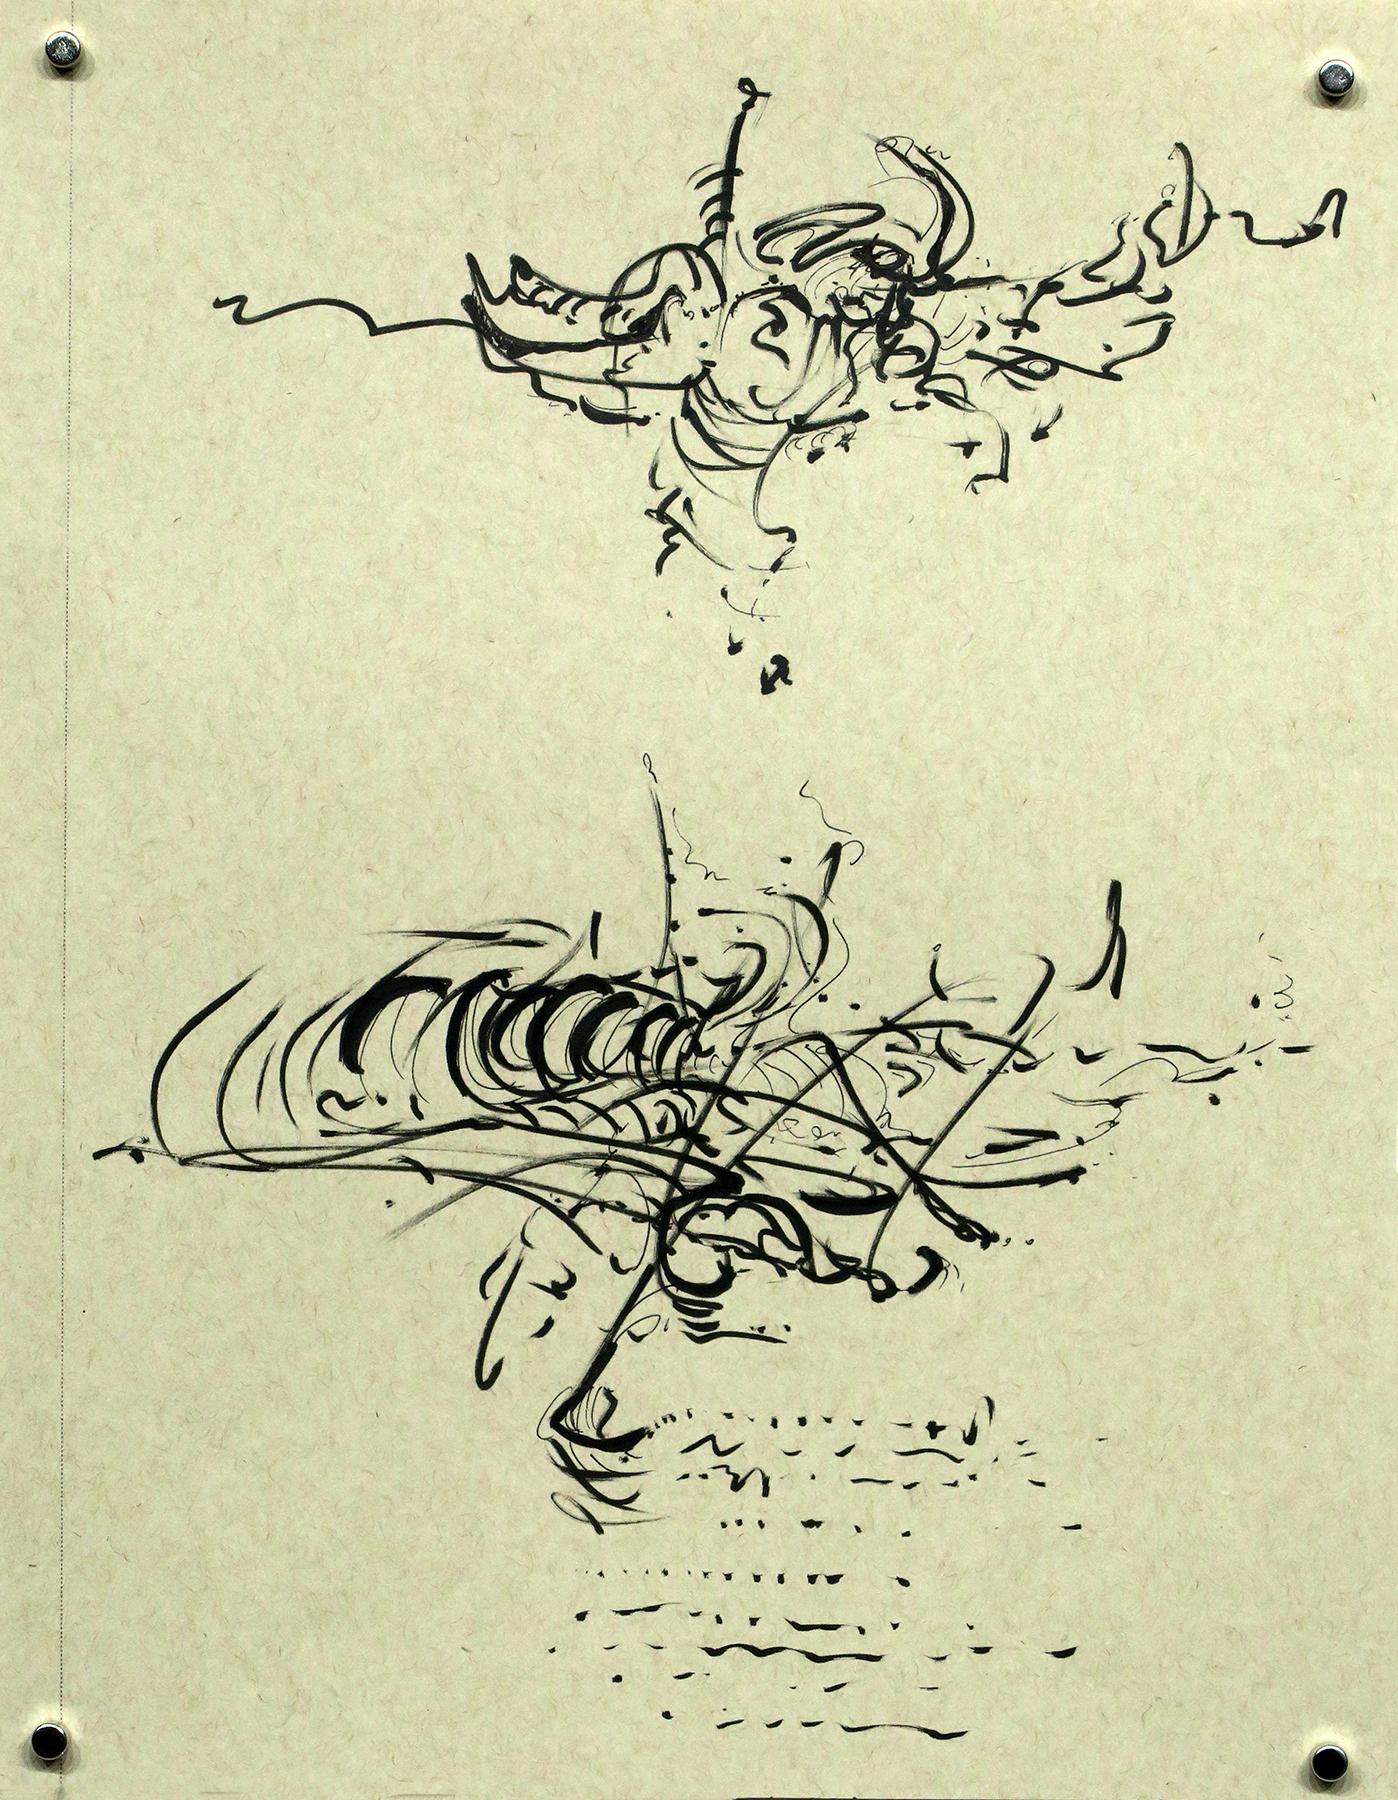 Kathryn Hart, Daunting Transitions, Krakow, Ink Drawing 7